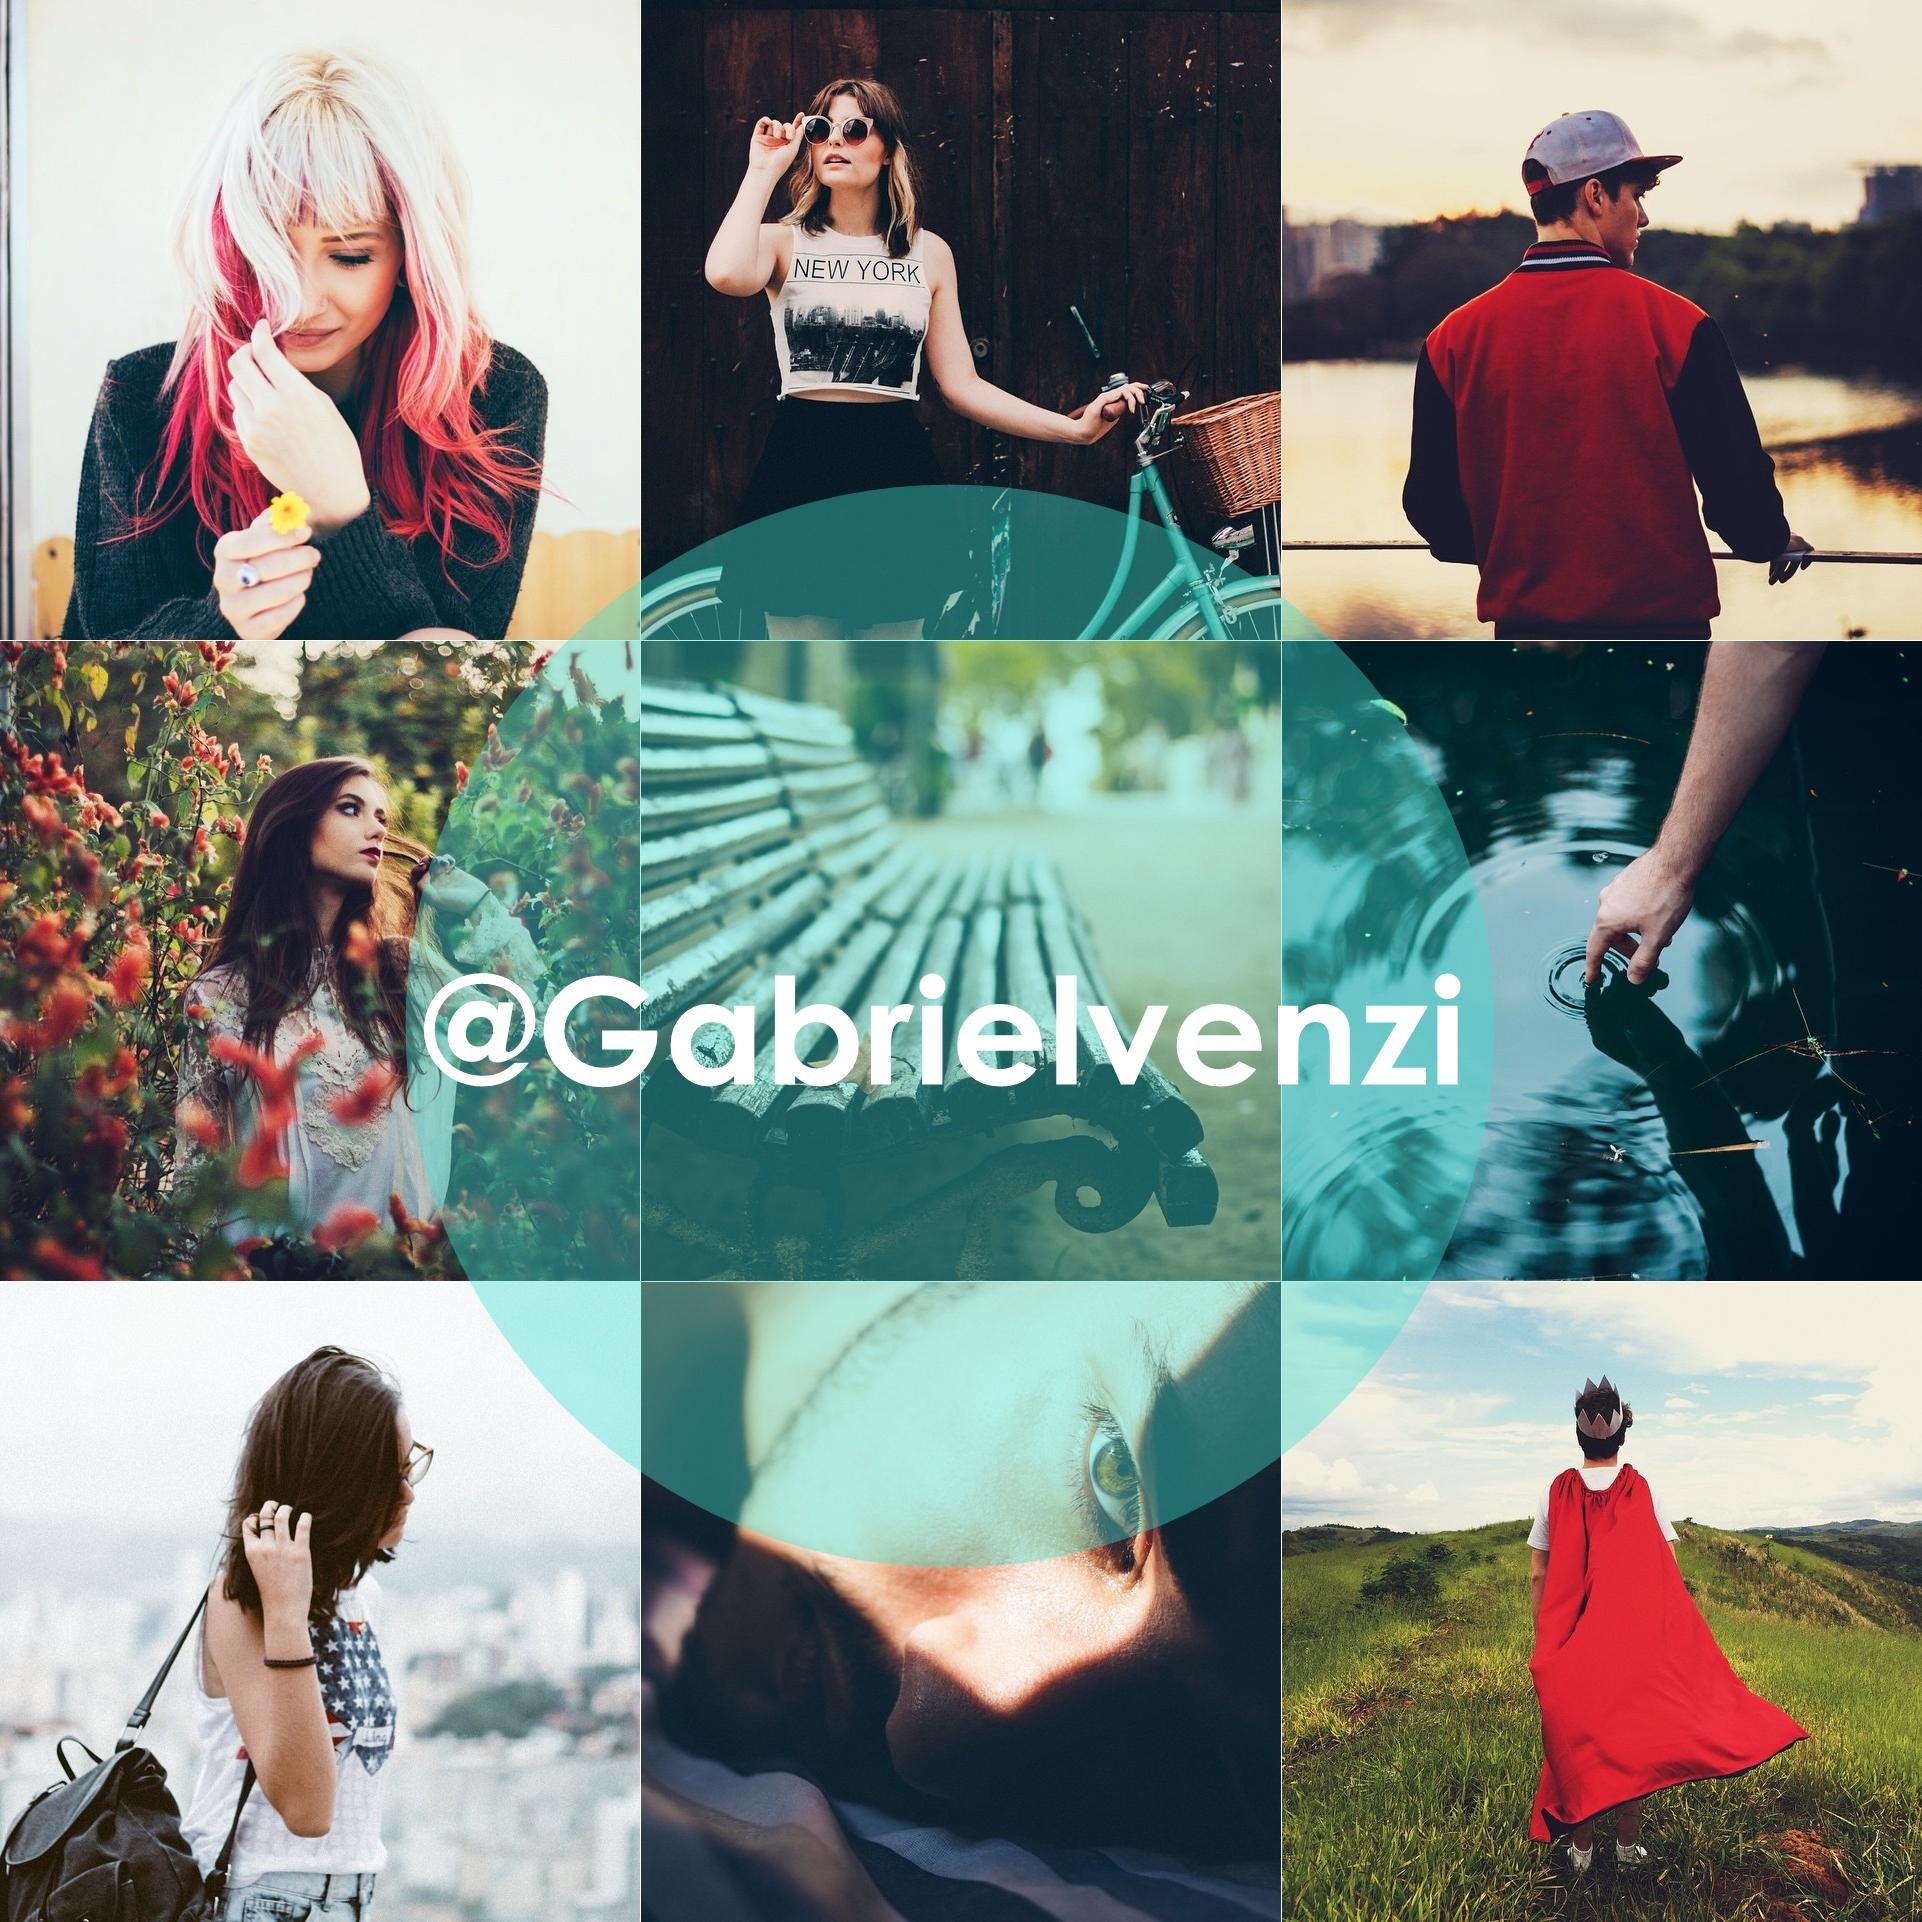 instagram-gabrielvenzi